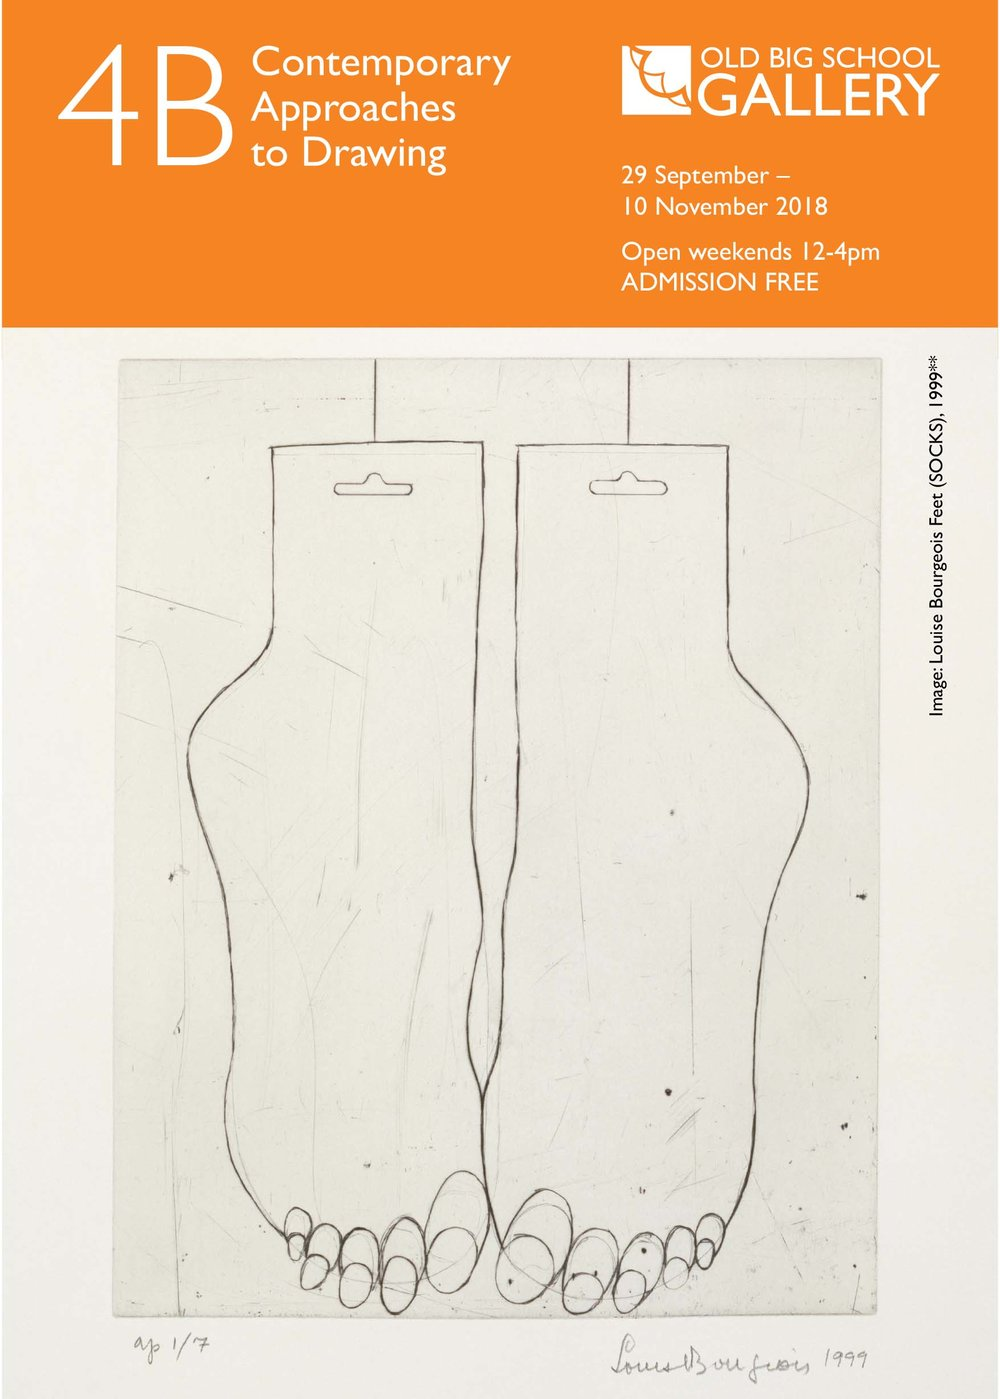 4B exhibition flyer.jpg